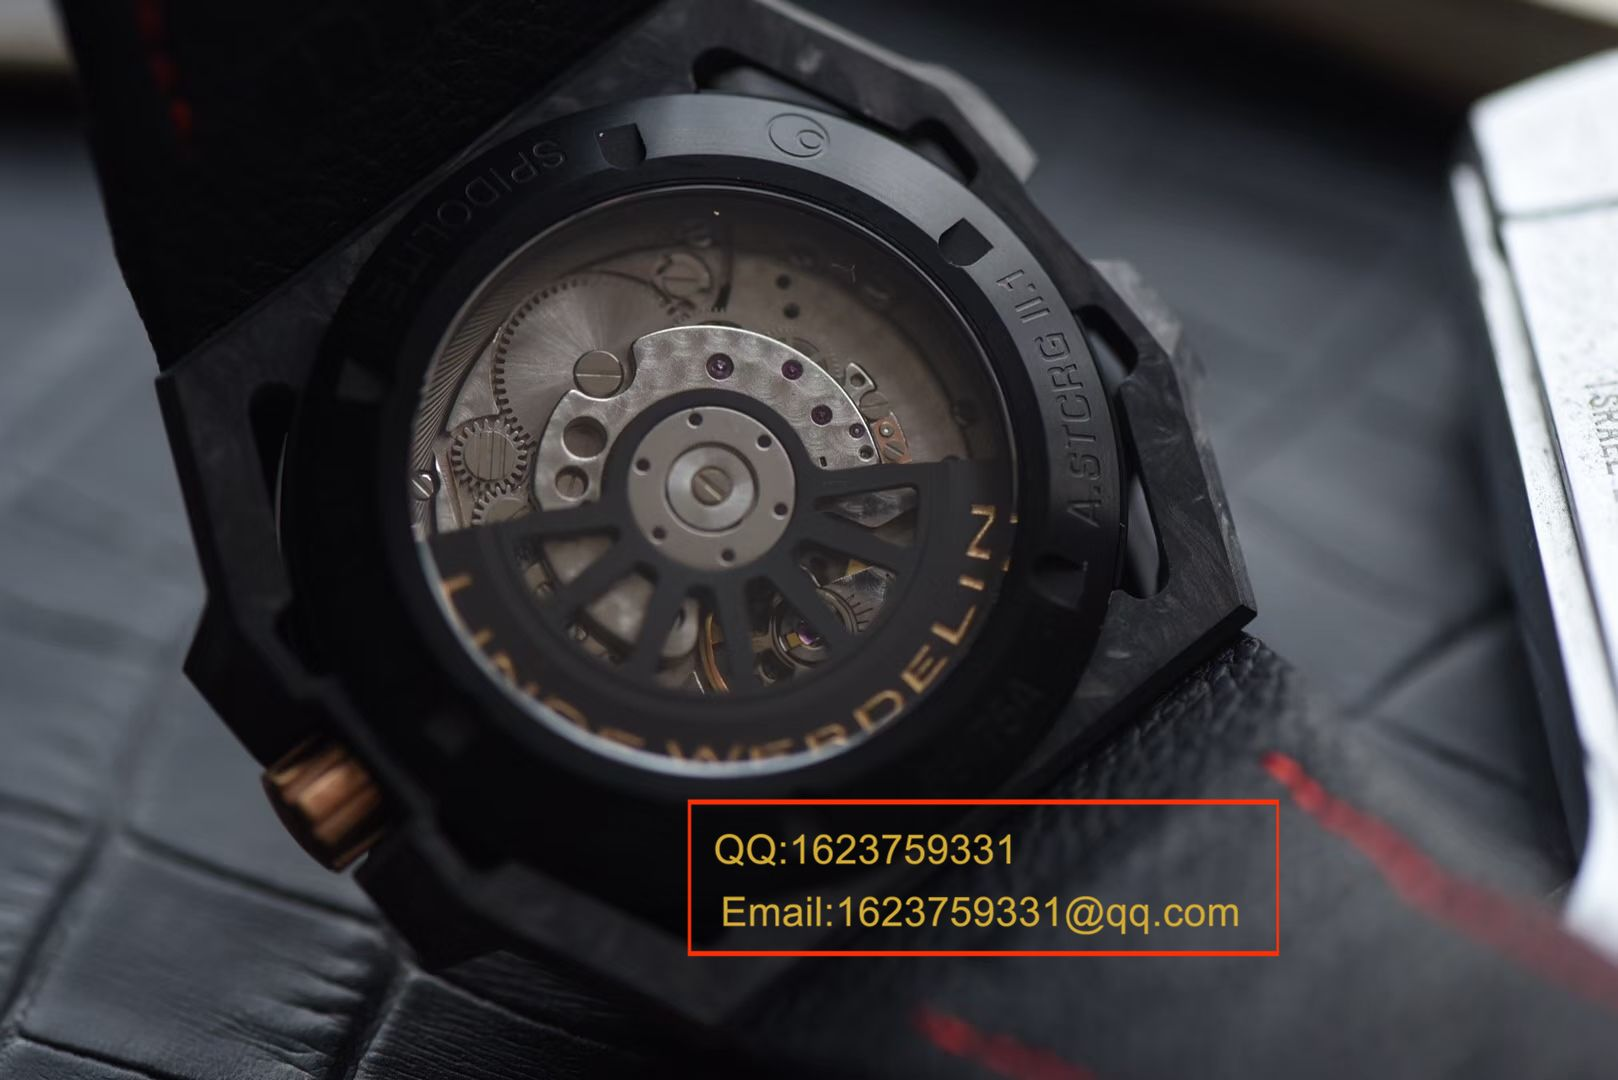 【XF厂一比一超A高仿手表】瑞士钟表制造商 Linde Werdelin (林德维纳)SPIDOLITE TECH GREEN watch